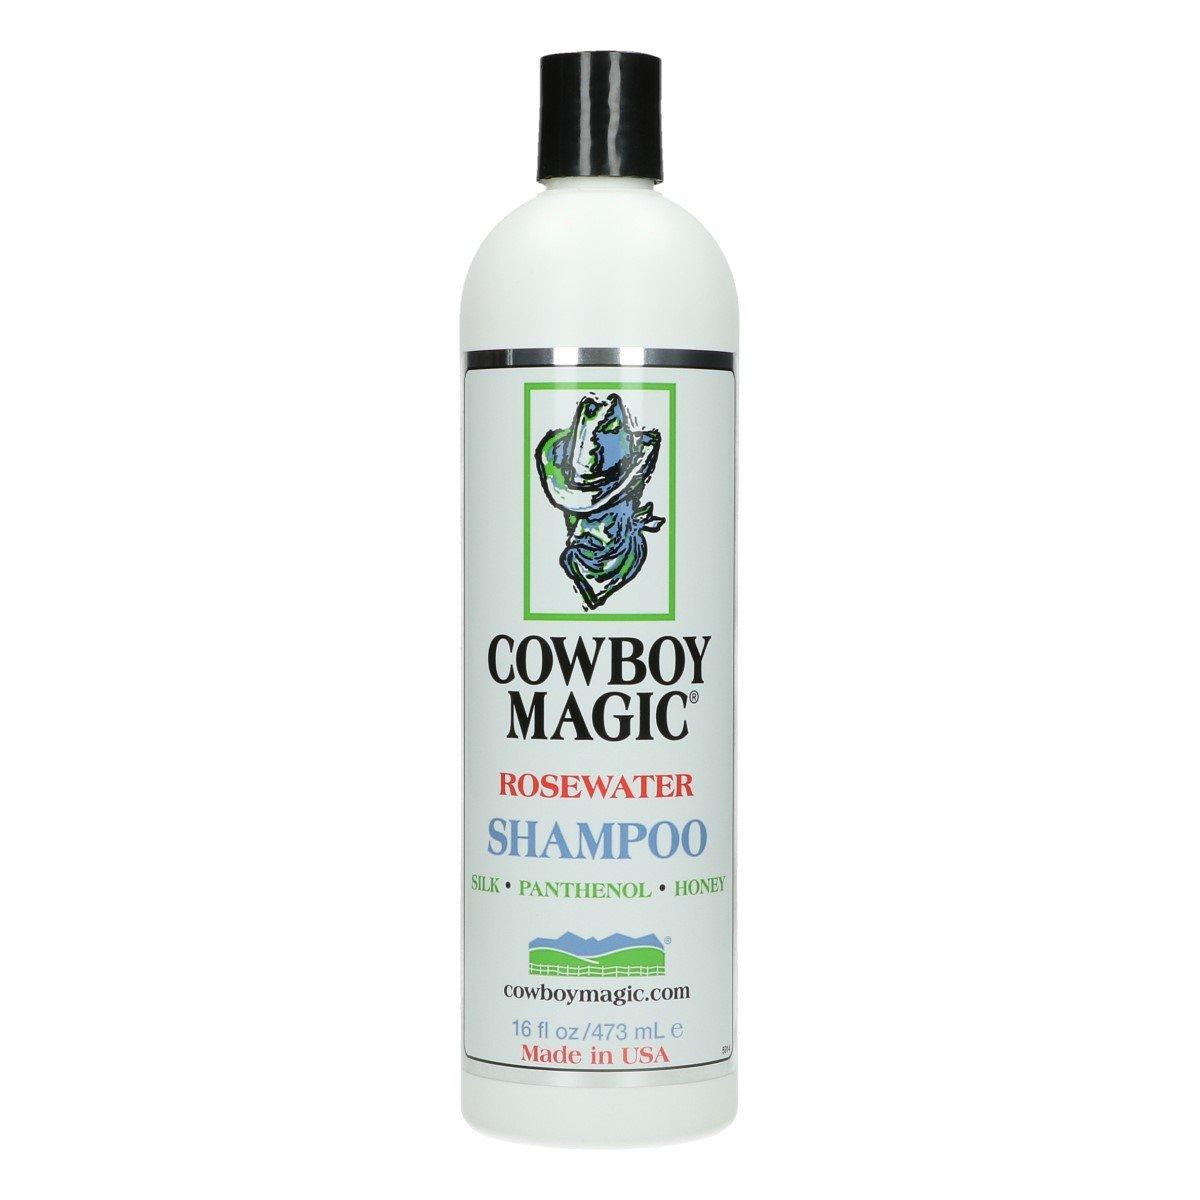 Afbeelding van Cowboy Magic Rosewater Shampoo 473ml